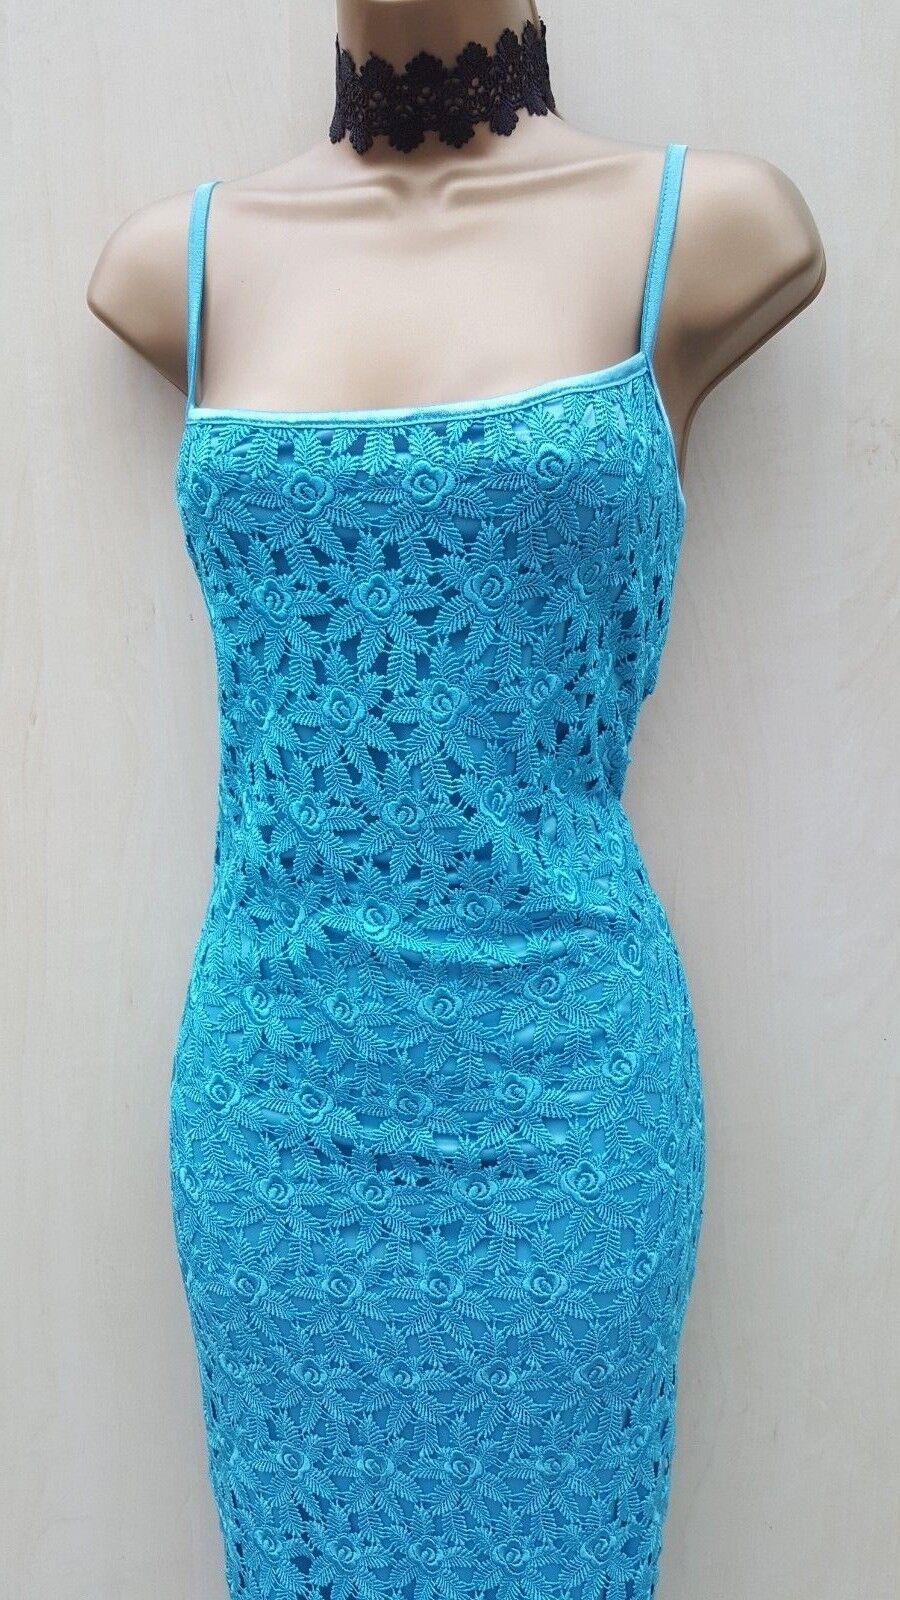 Size 10 UK KAREN MILLEN Vintage 20's Turquoise Floral Lace Cruise Party Dress